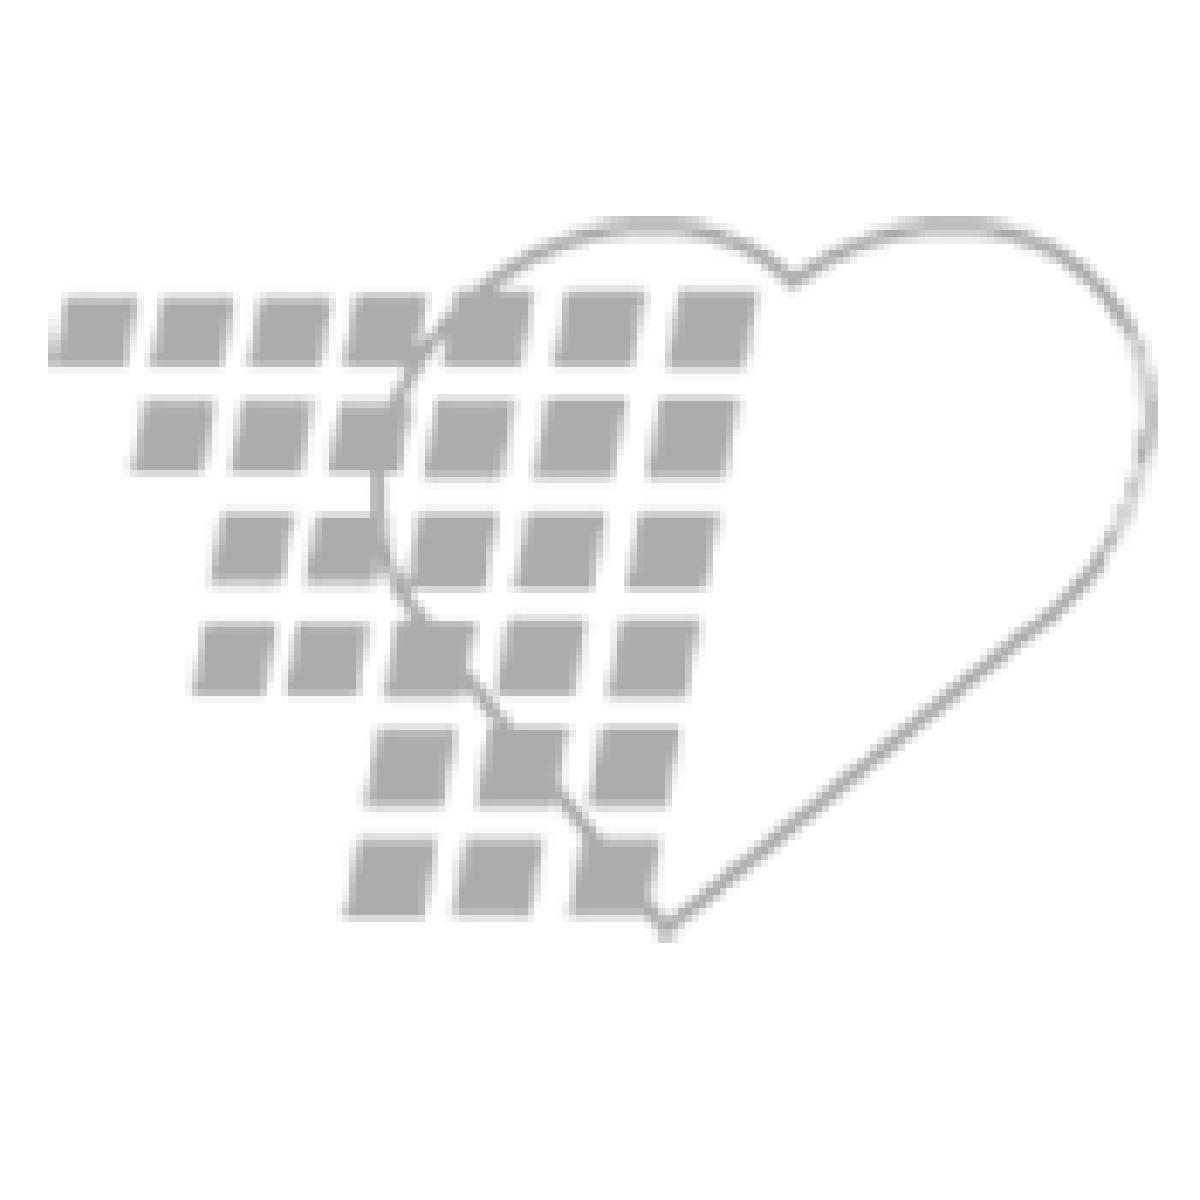 12-81-1615 - Simulaids Adolescent Choking Manikin